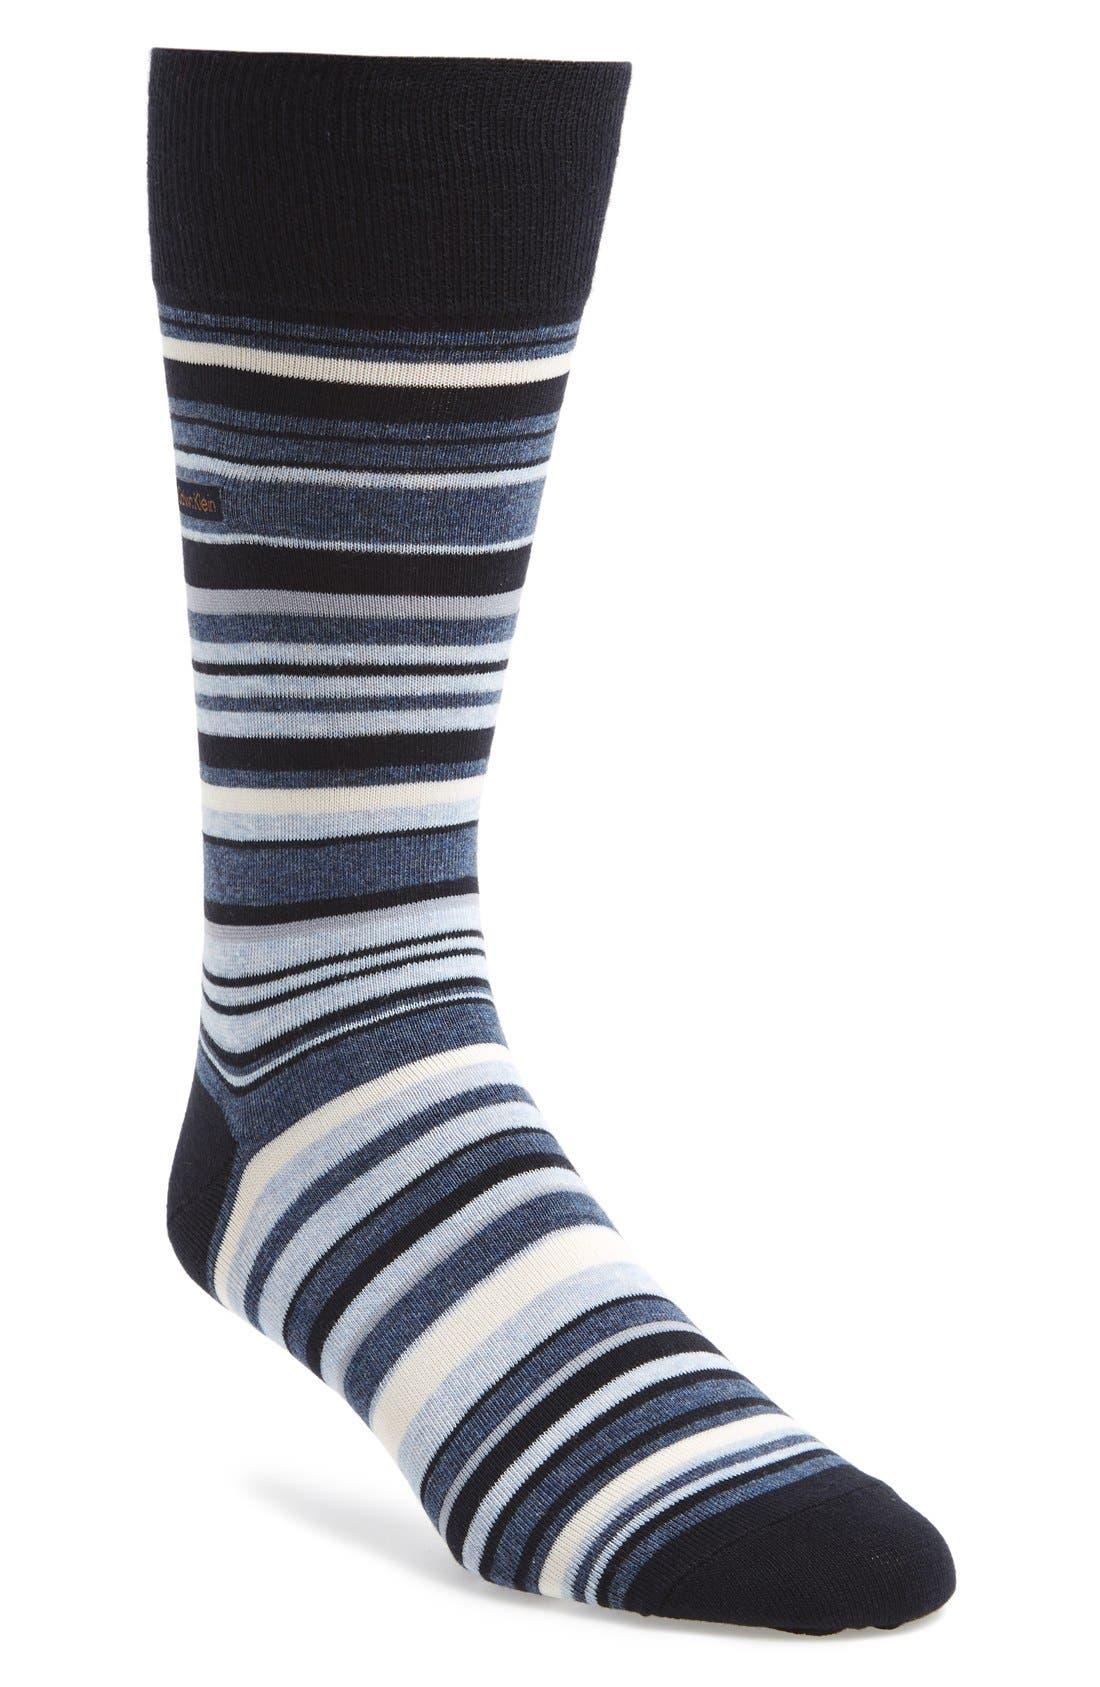 CALVIN KLEIN Multistripe Emblem Socks, Main, color, NAVY/ DENIM HEATHER